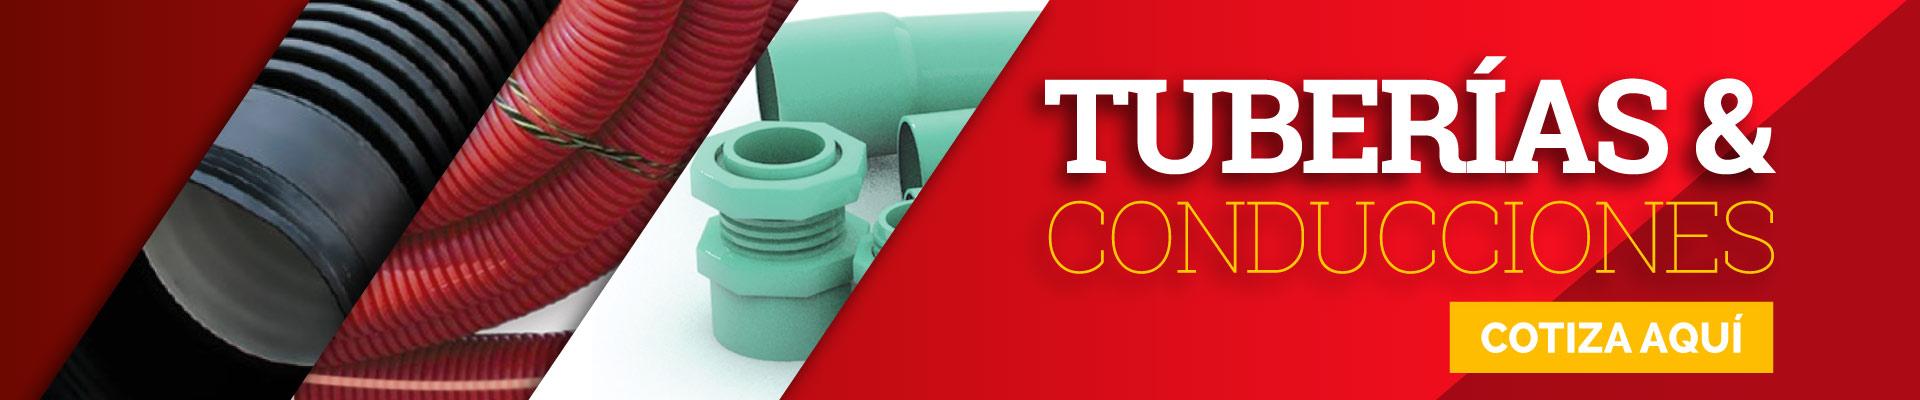 banner-tuboflex-condutec-yunfer-tuberia-flexible-polietileno-cableado-electrico-puebla-tlaxcala-mexico-2018